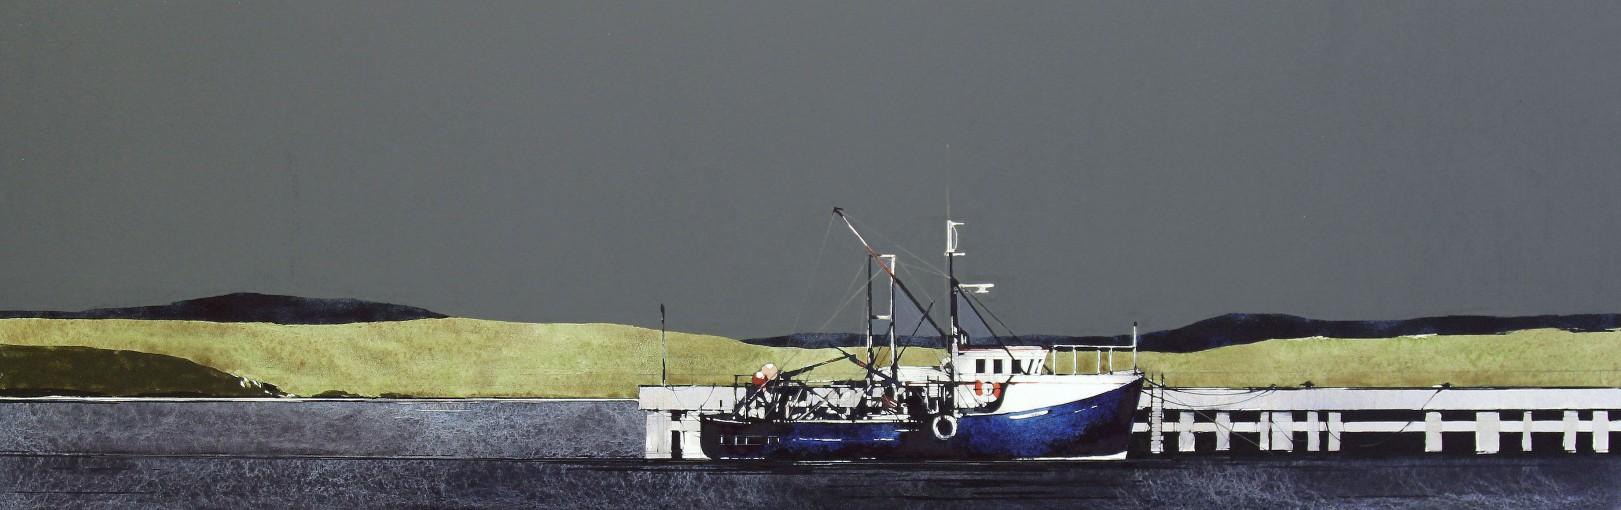 Ron Lawson_Fishing Boat, Gigha_EAS582_Watercolour & Gouache_10.5x32.5